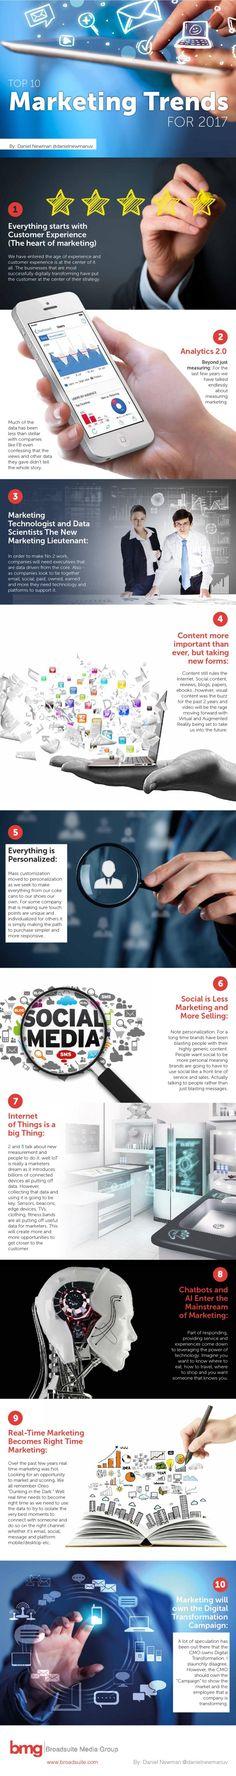 374267 Internet e redes sociais (20171) Pinterest - marketing action plan template